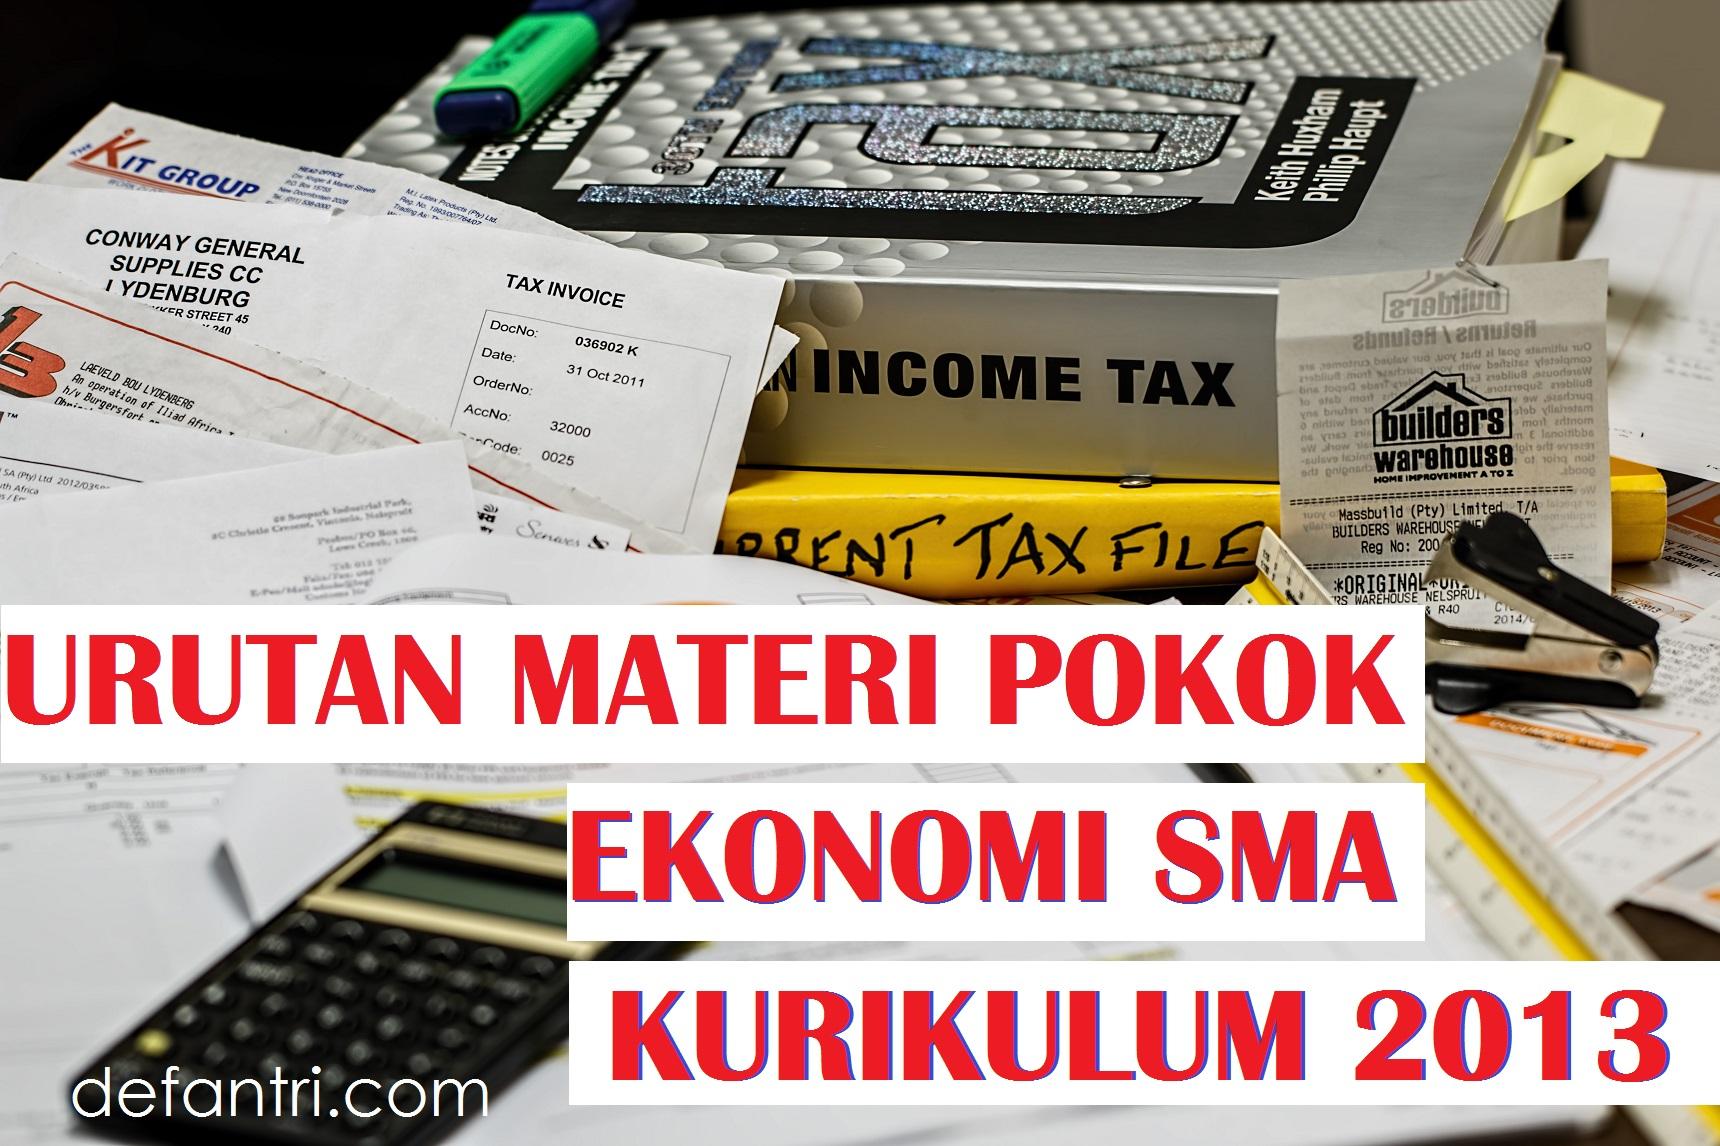 Urutan Materi Pokok Pembelajaran Ekonomi SMA Kurikulum 2013